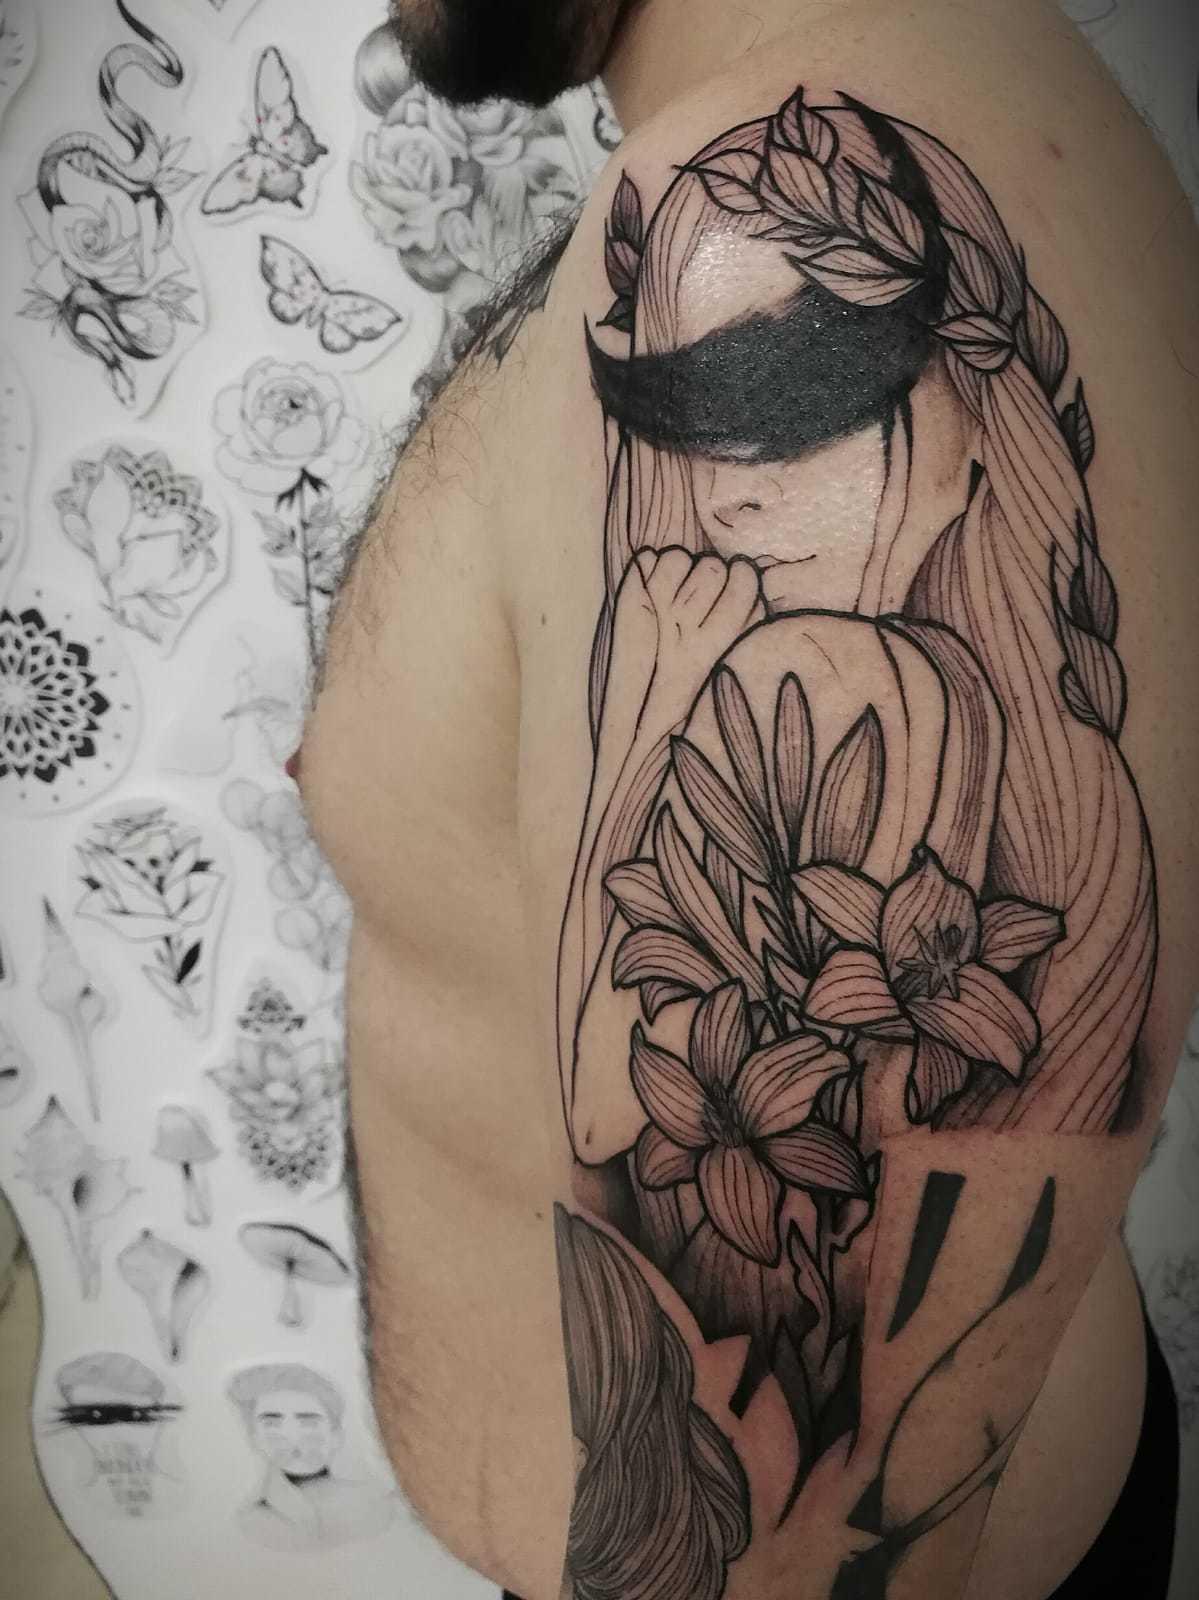 Ligera-ink-tattoo-milano-tatuaggi-milano-migliori-tatuatori-milano-tatuaggi-blackwork-milano-tattoo-blackwork-milano-tattoo-avangarde-9